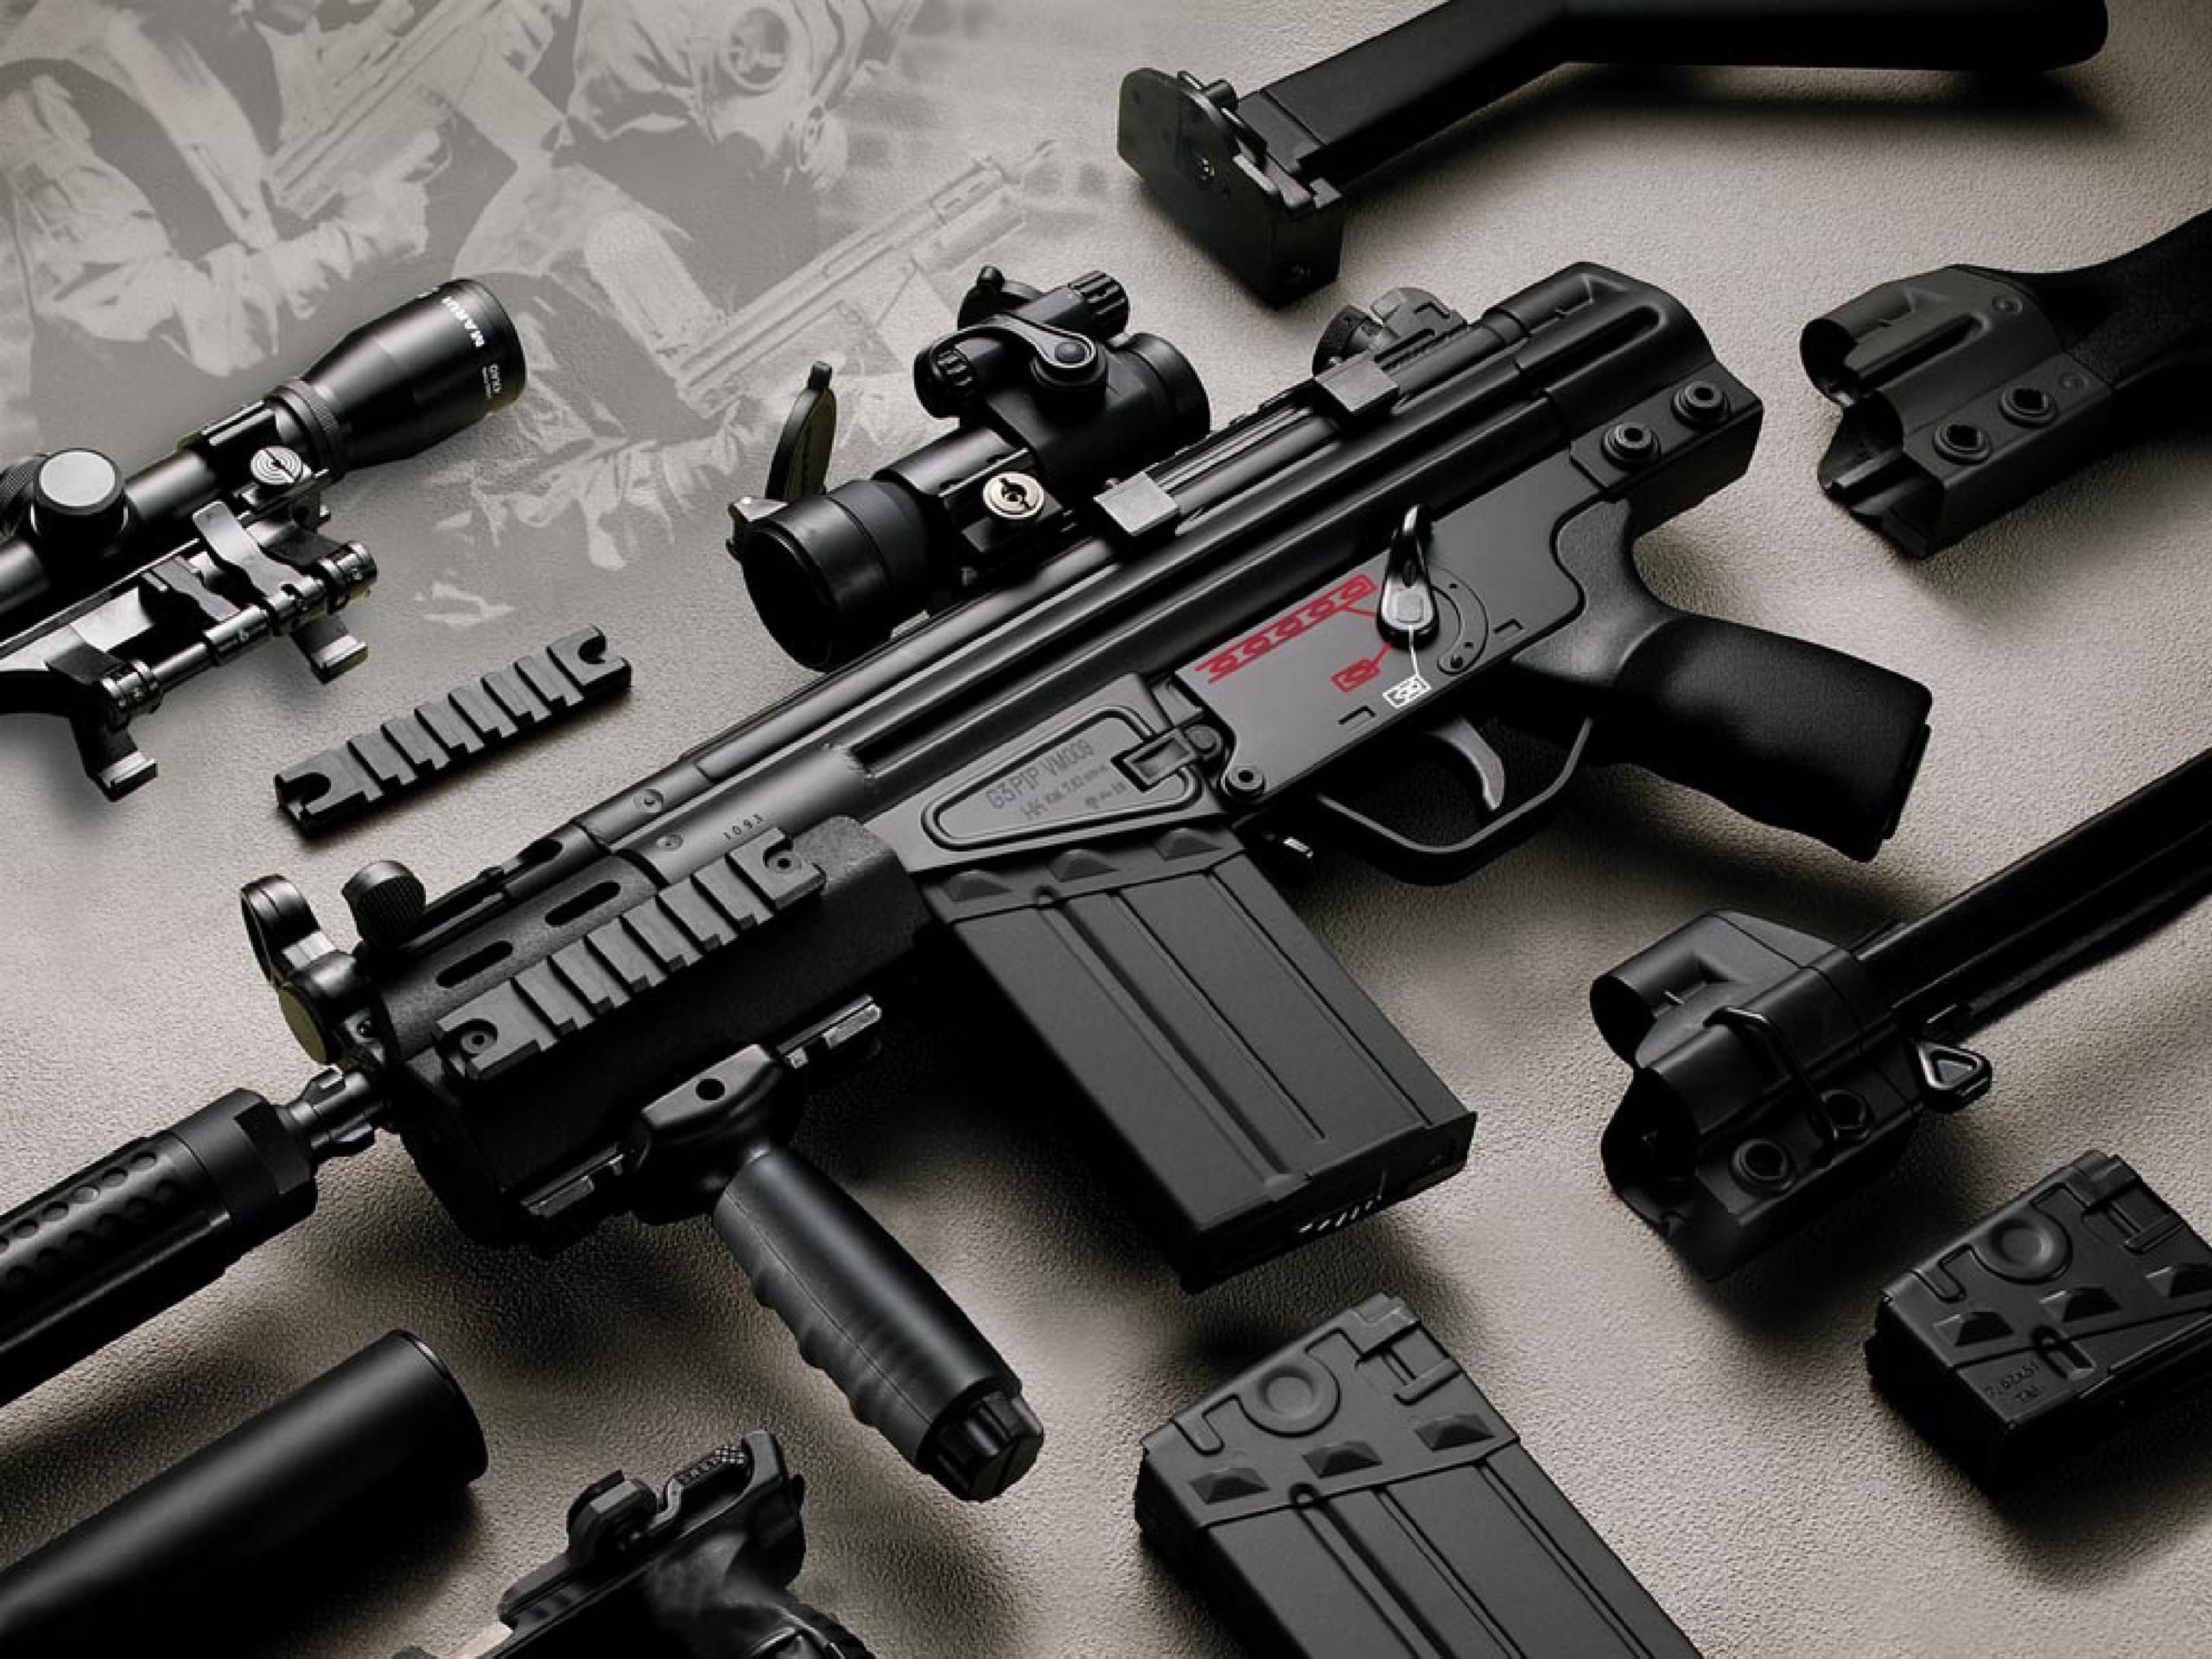 Wallpaper download gun - Hd Guns Wallpaper Download Hd Guns Weapons Wallpapers Webgranth